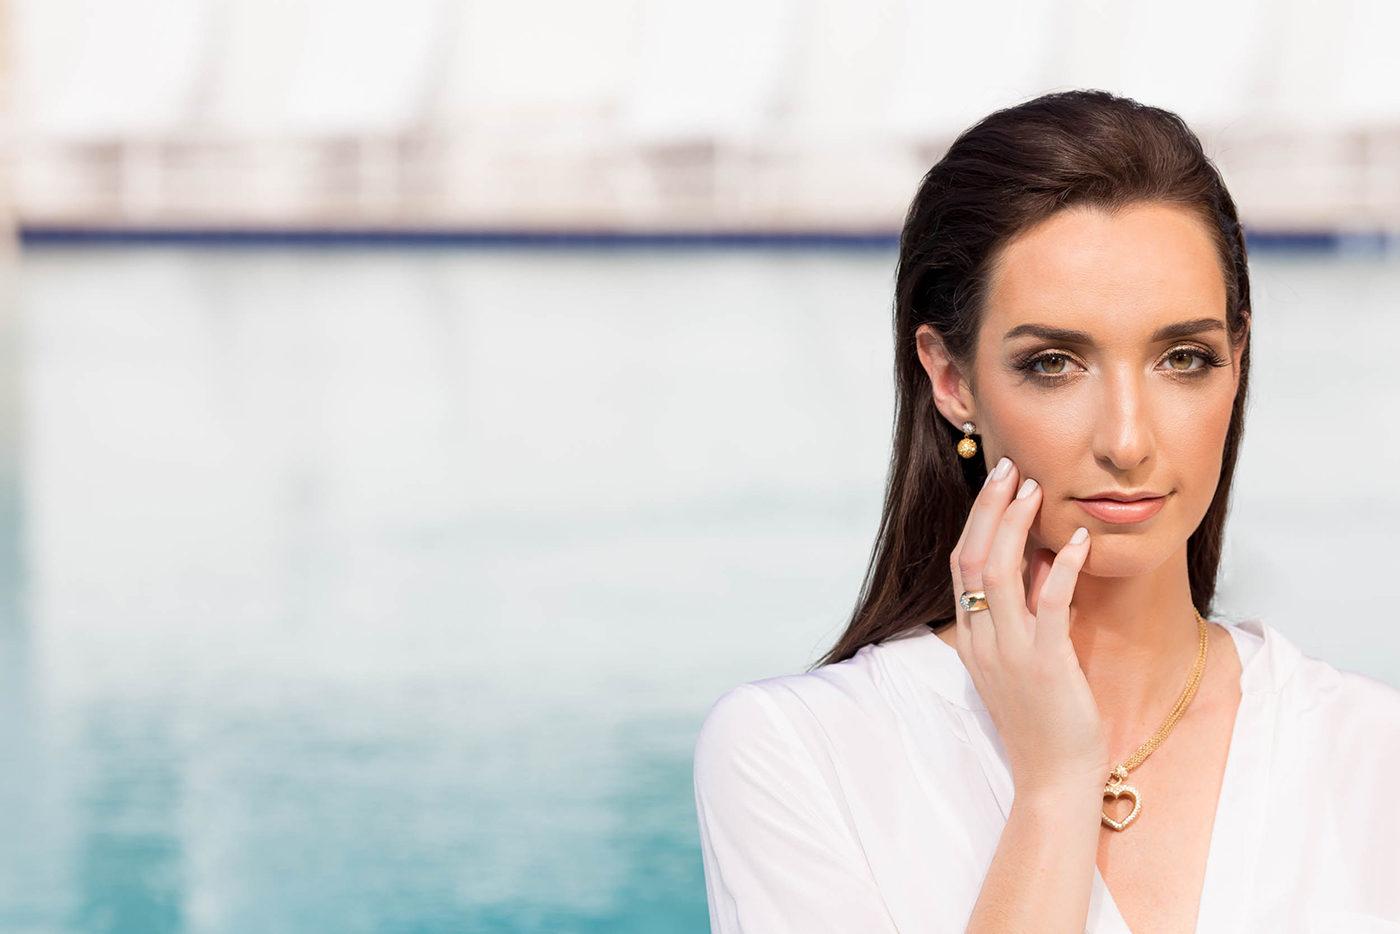 Lifestyle Photoshoot | Jewelry Brand | Sara Kauss Photography